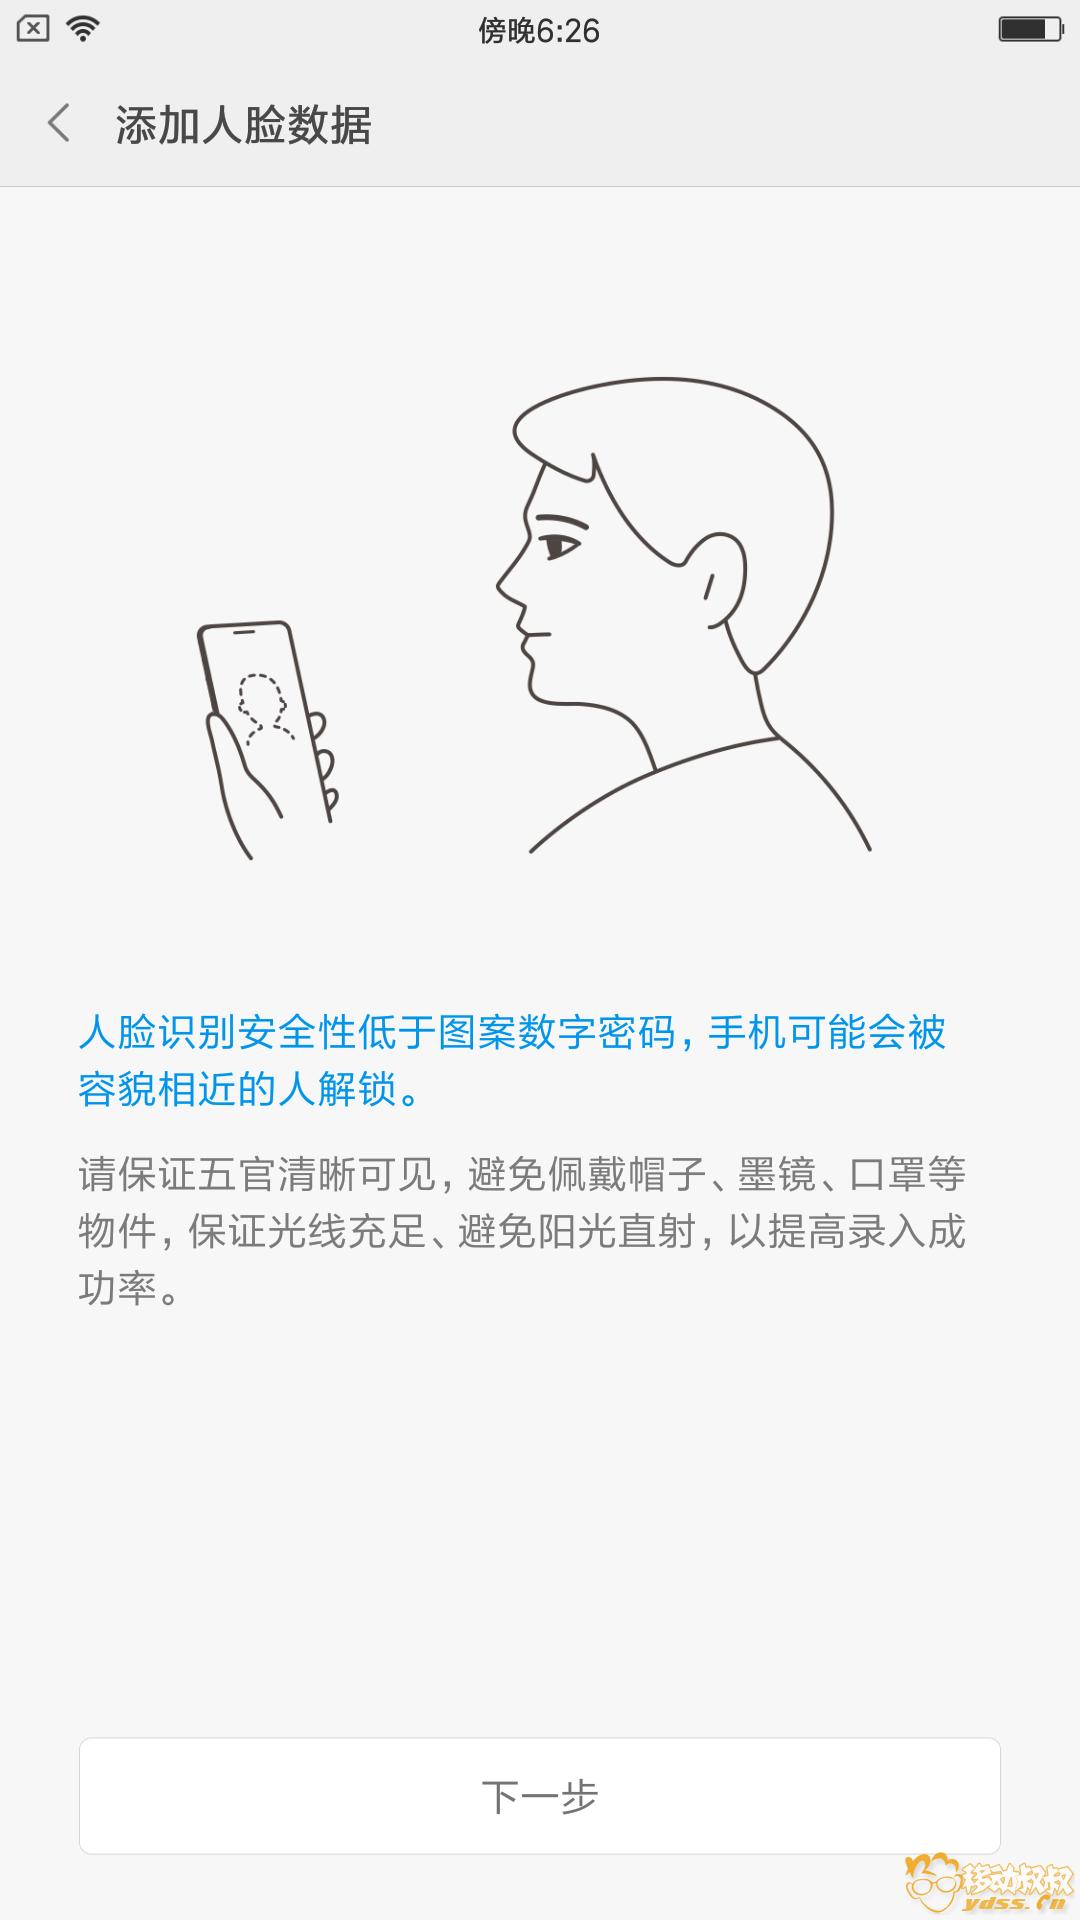 Screenshot_2017-12-30-18-26-53-681_com.android.keyguard.png